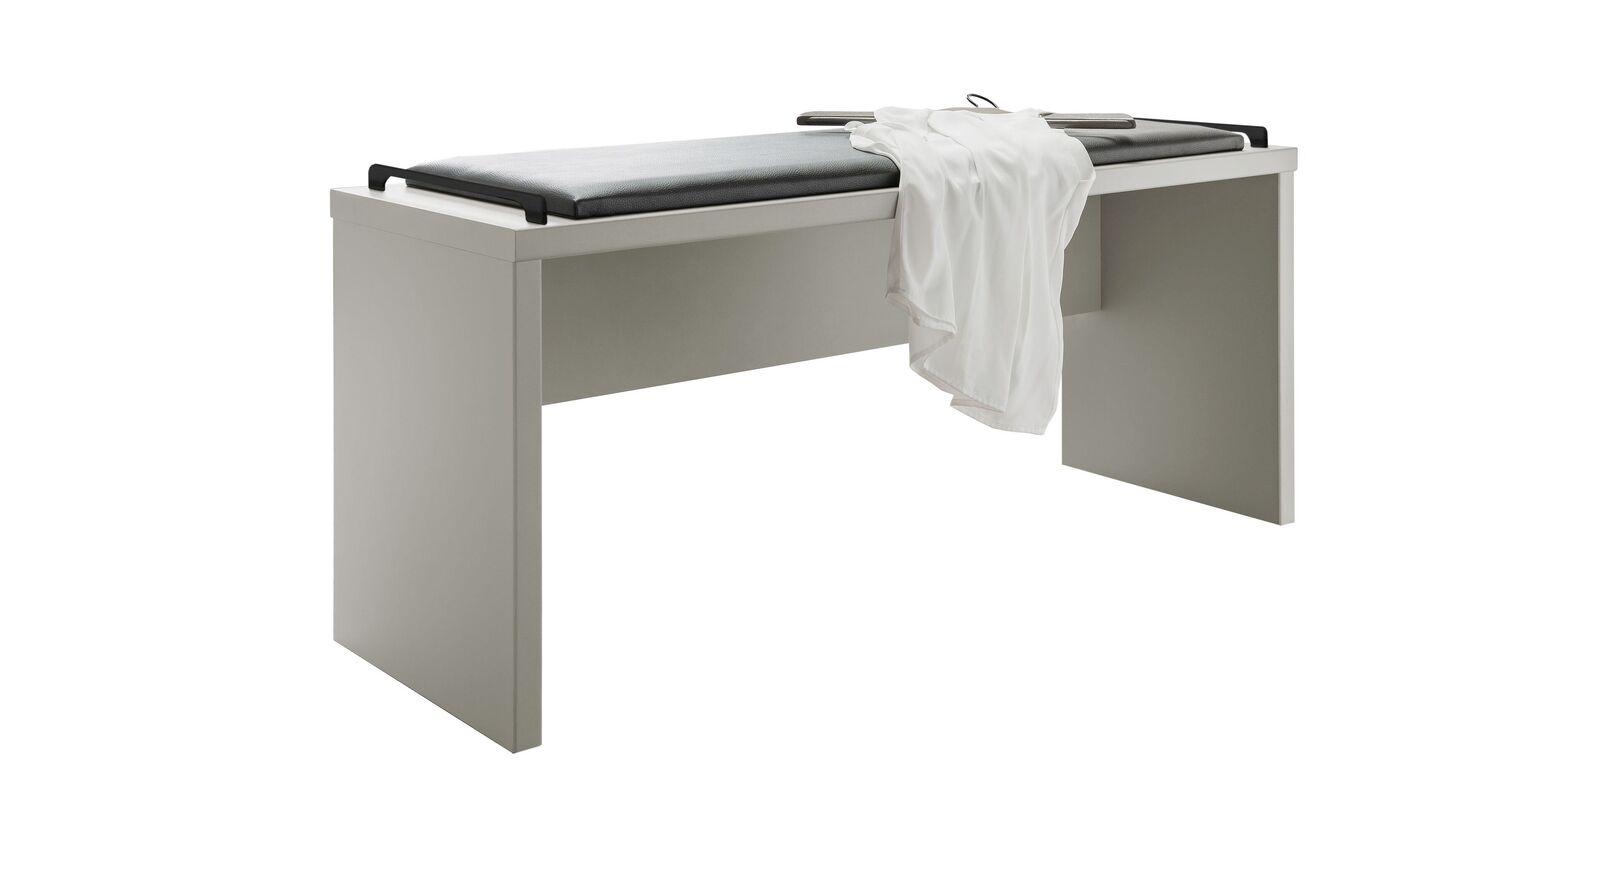 Bettbank Loyd inklusive Sitzpolster